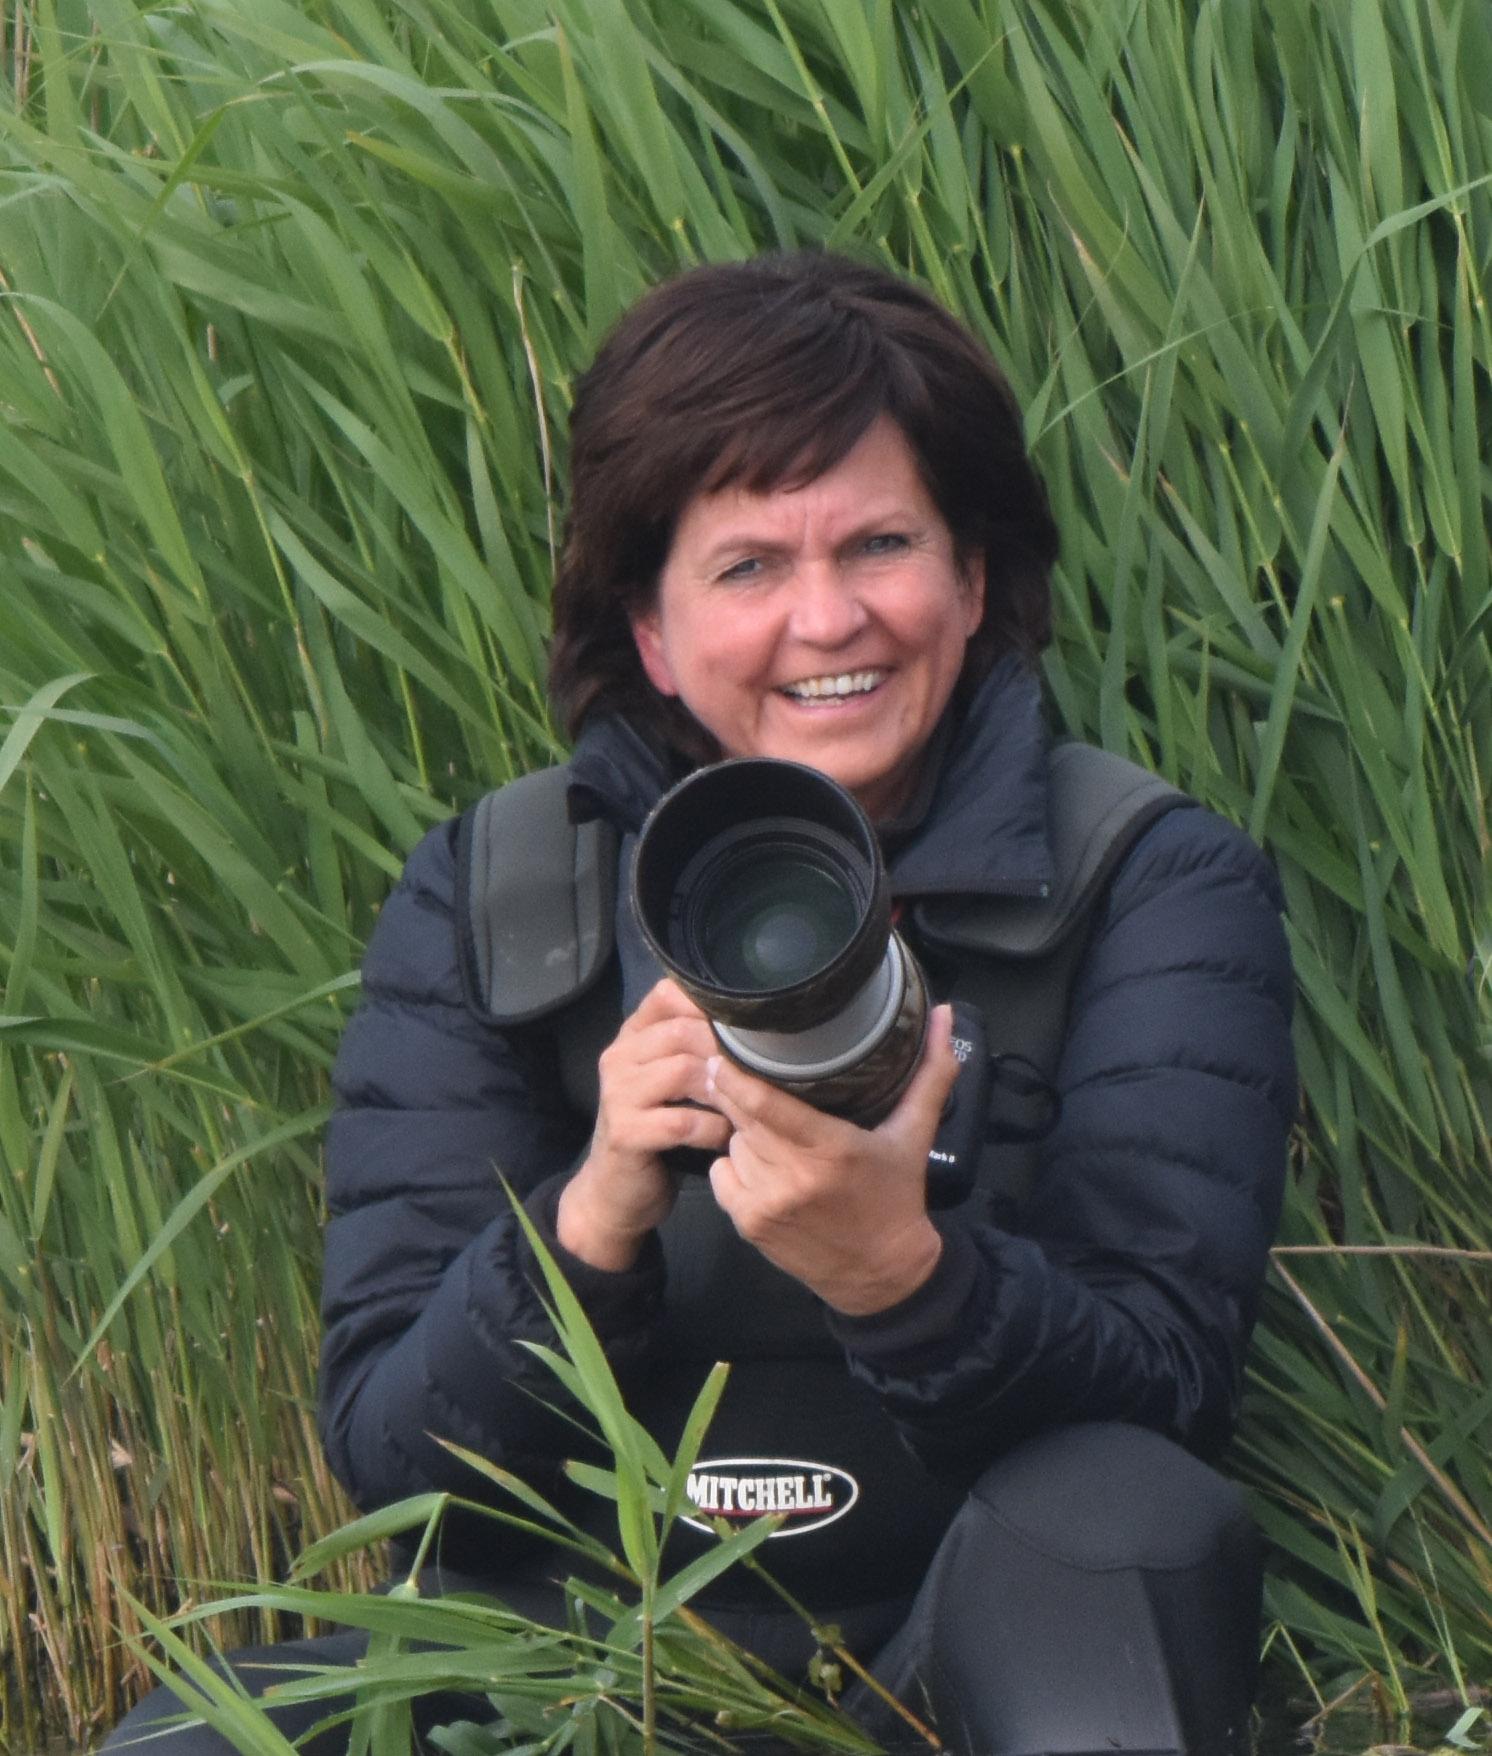 Natuurfotografe Eline Schaafsma